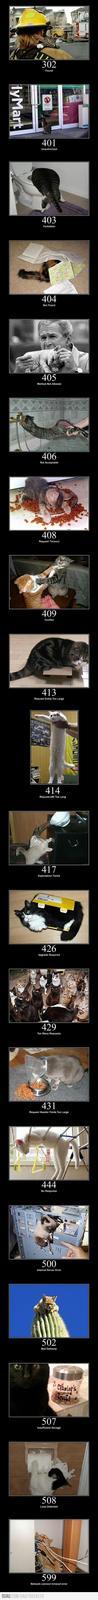 more status cats